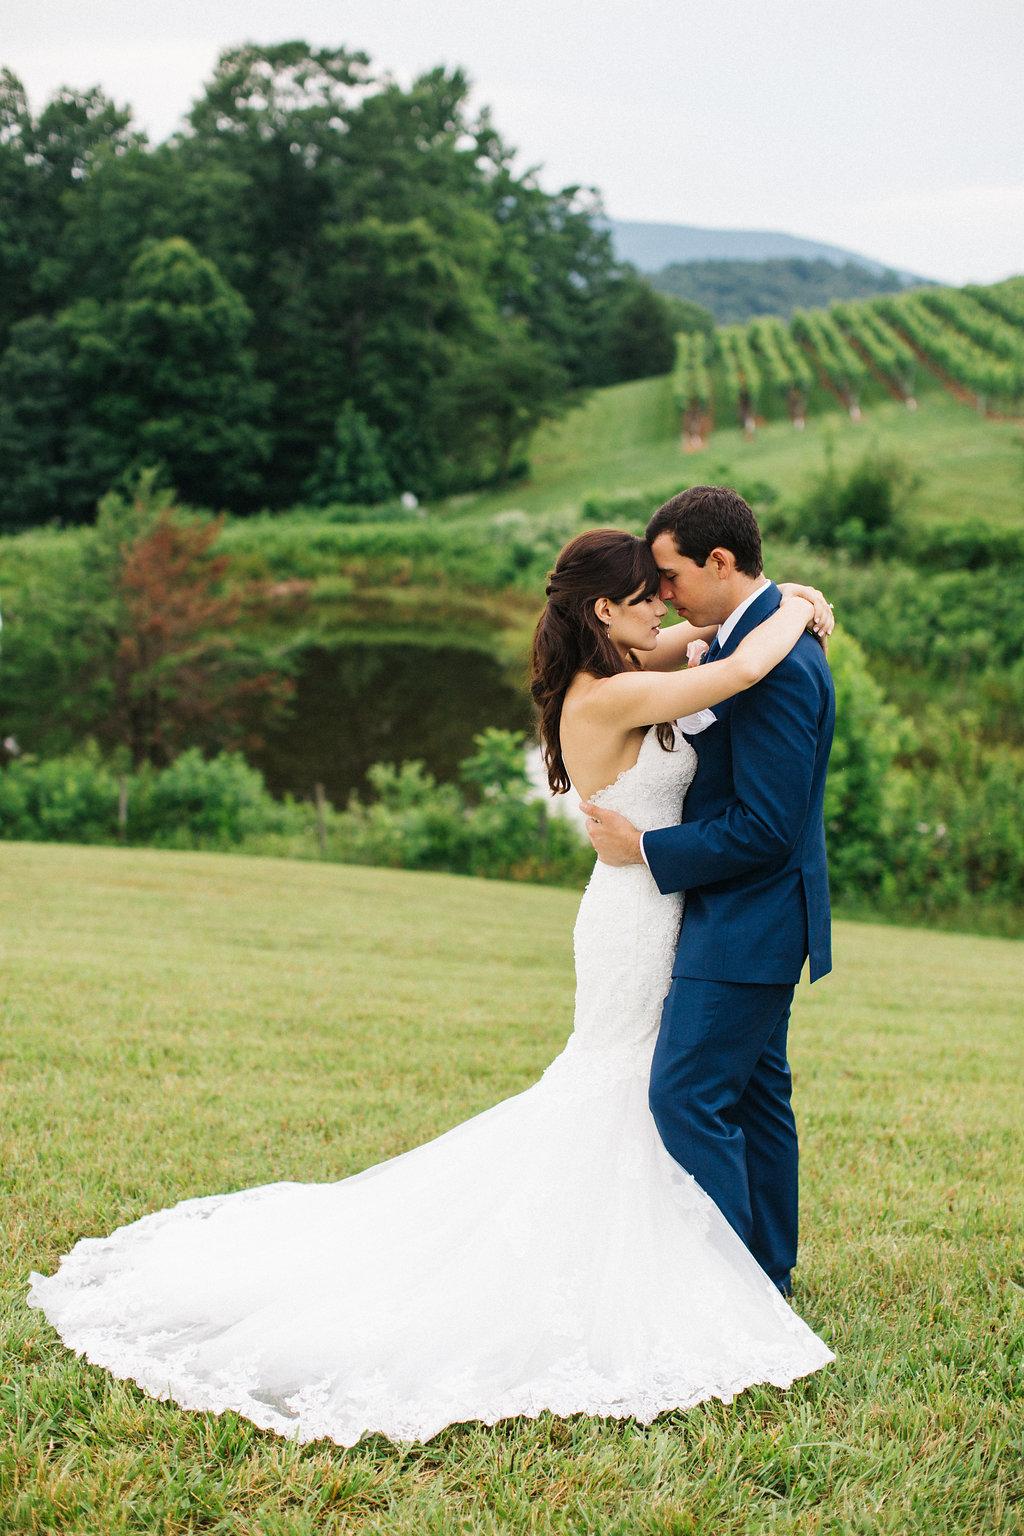 winey-blonde-vineyard-wedding-ideas (4).jpg